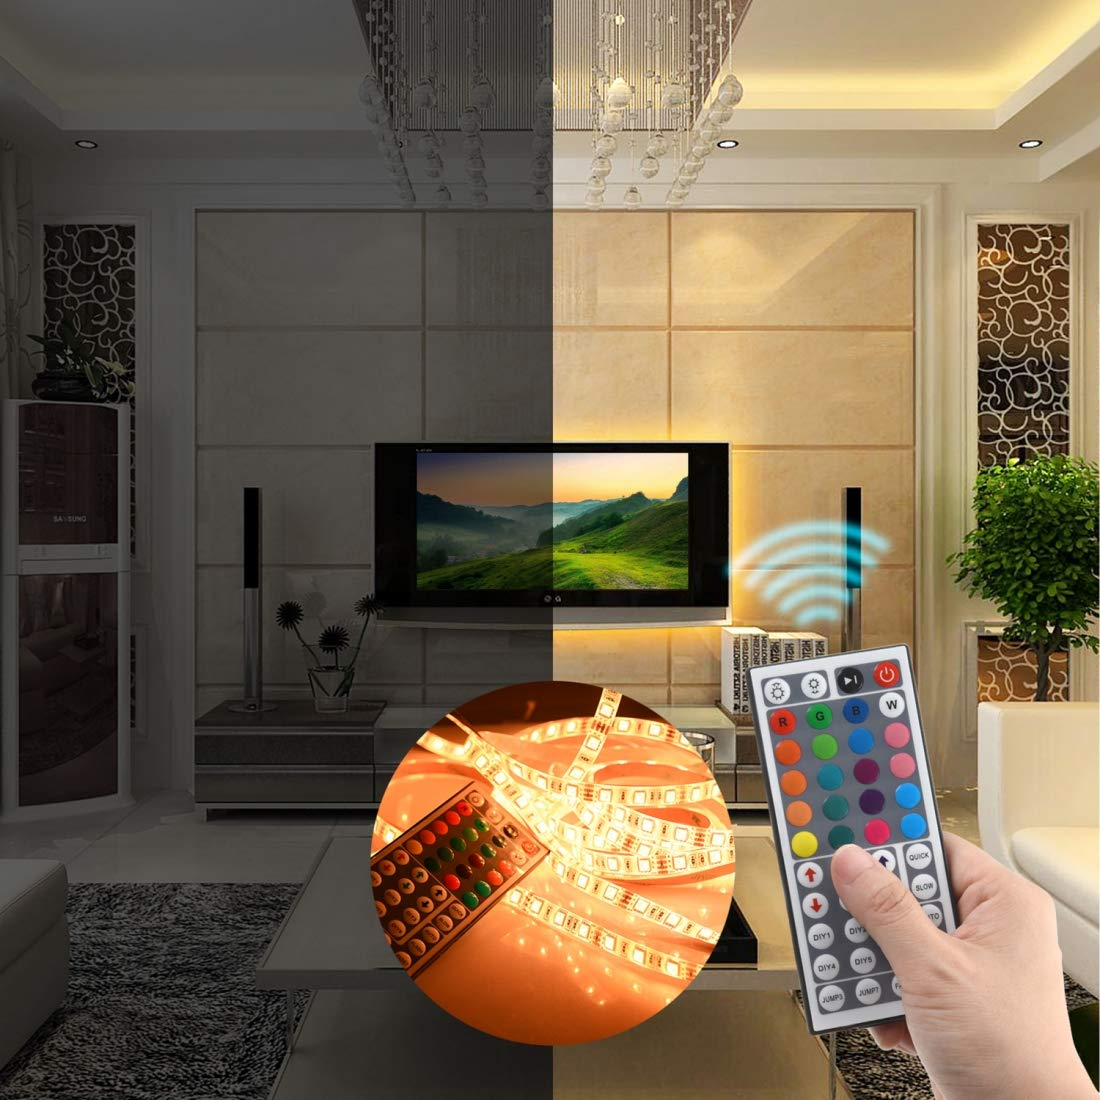 iRofa 44 Key IR Remote Controller and Adapter for RGB Flexible LED Light Strip iRofa-7-01